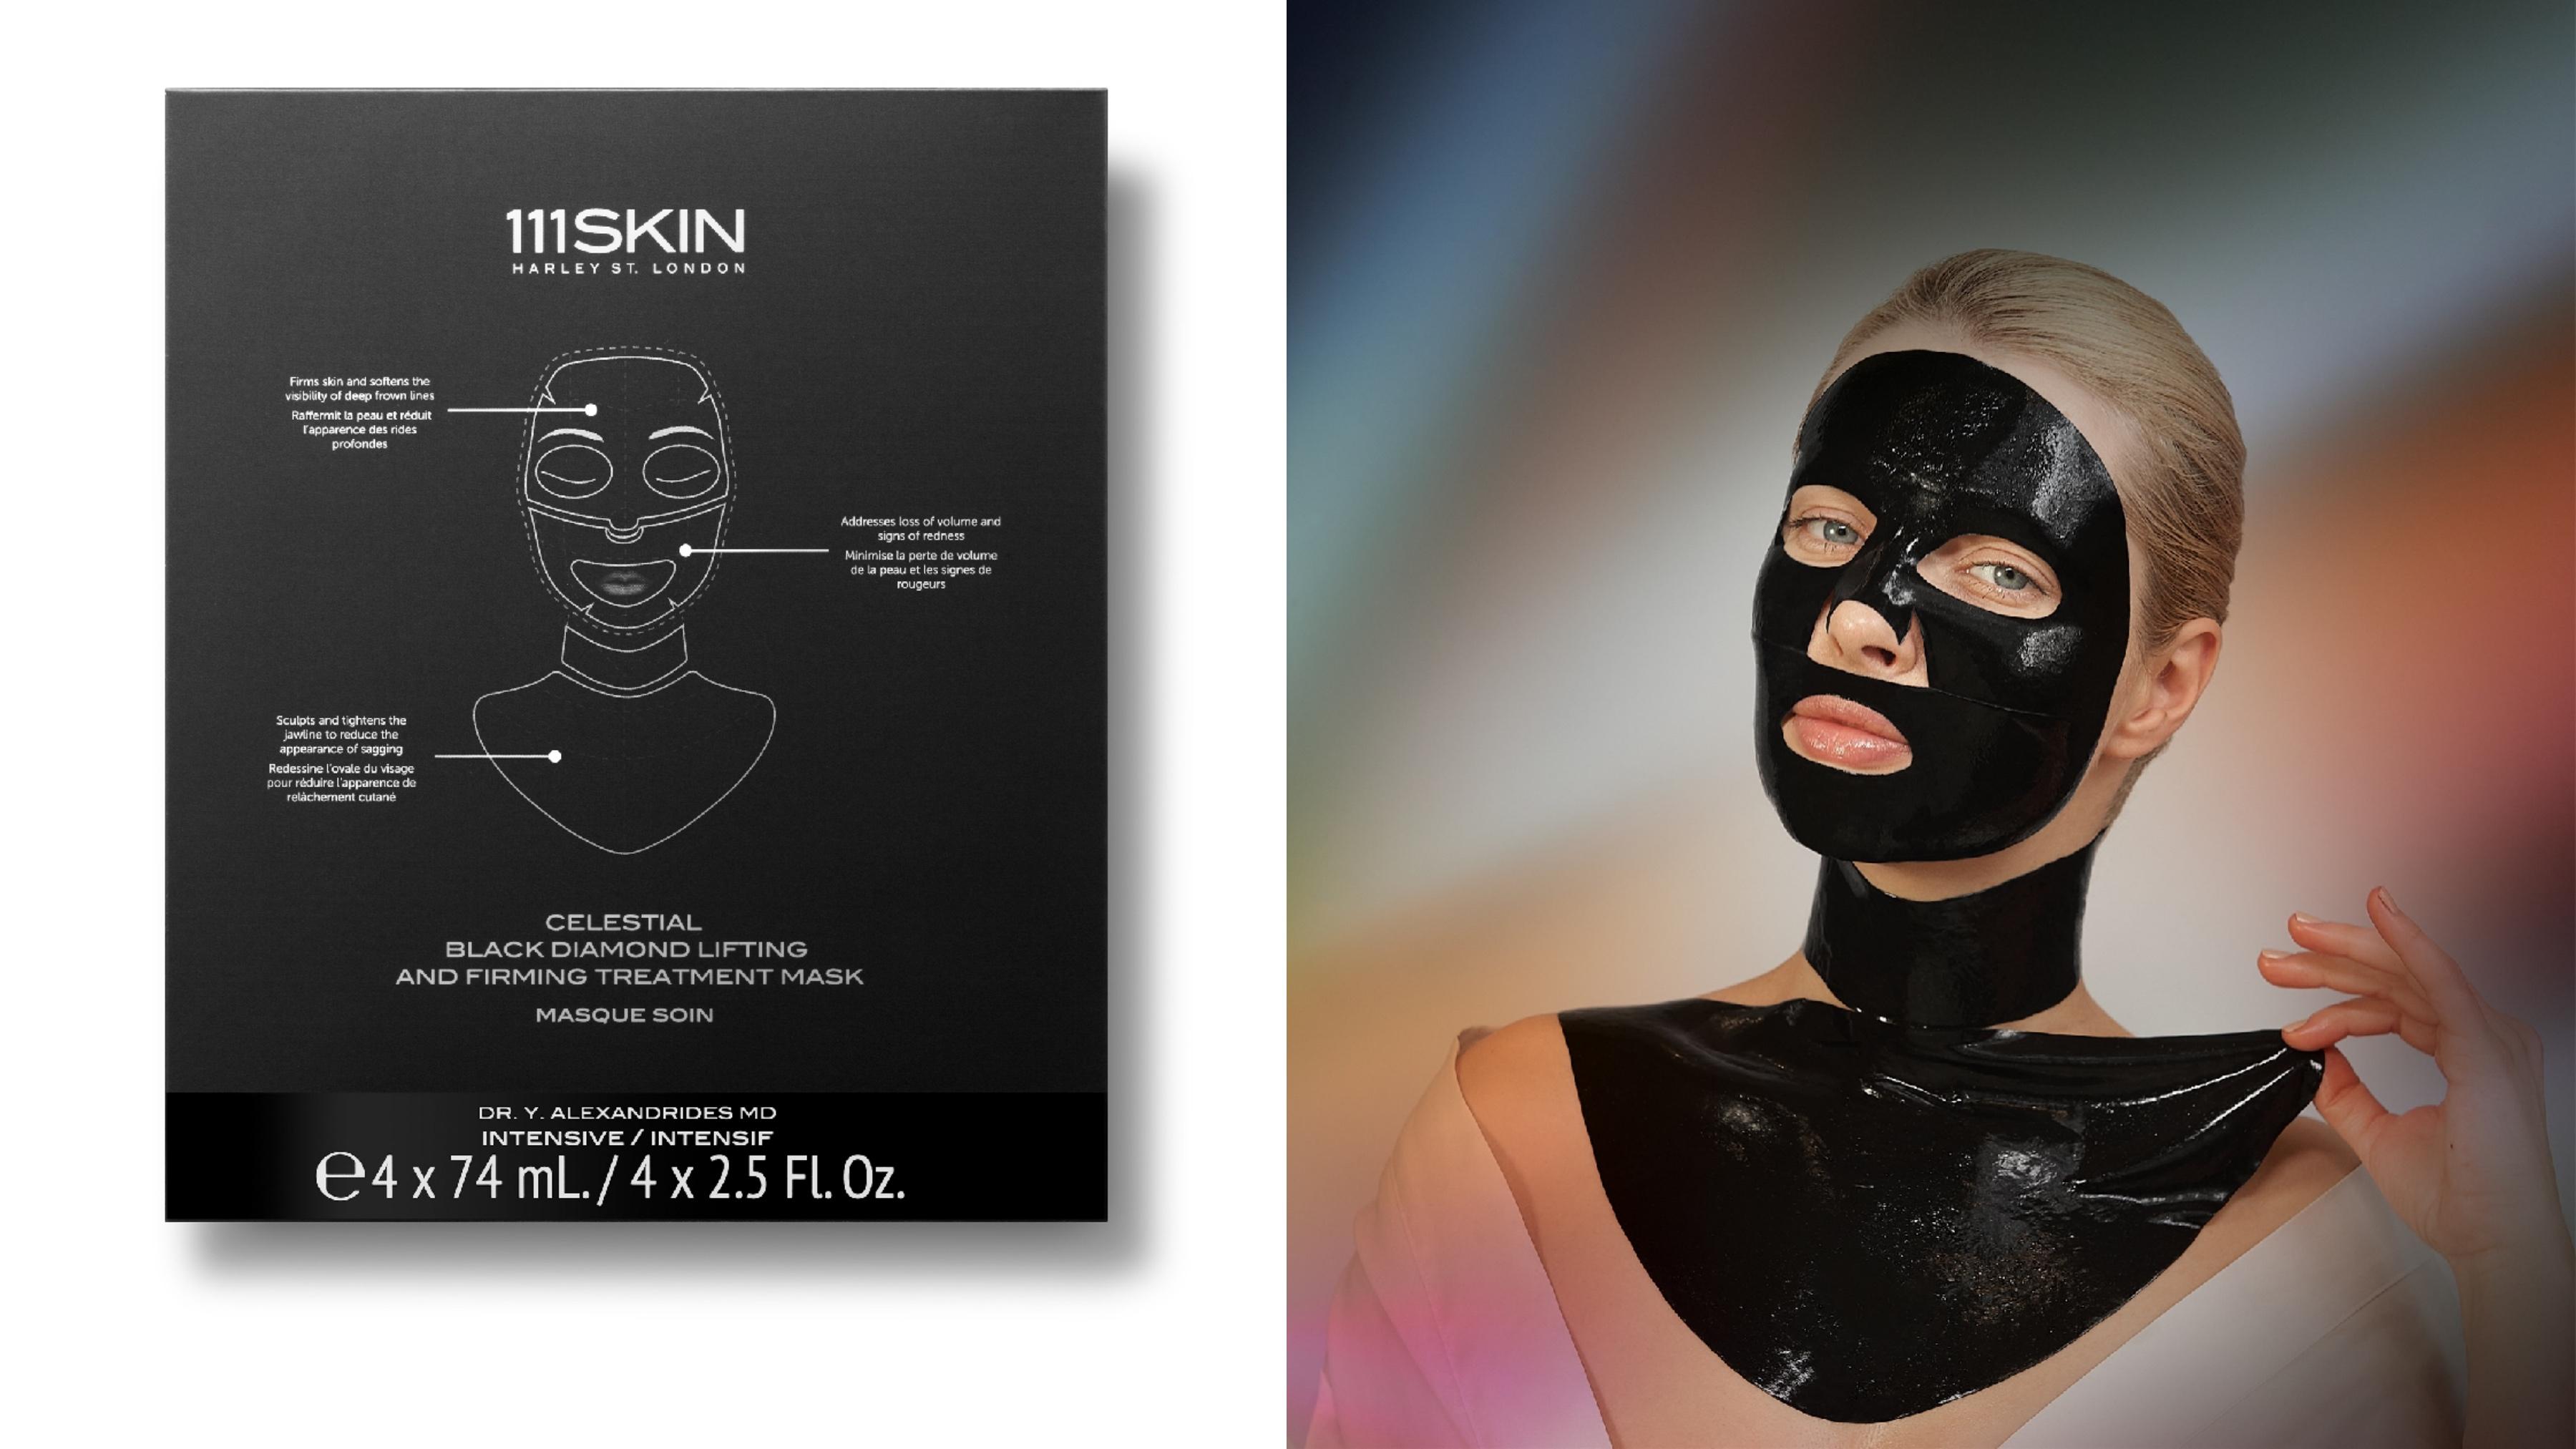 111SKIN黑鑽超光速黑色夢露面膜 74 ml x 4份 / NT. 6,480